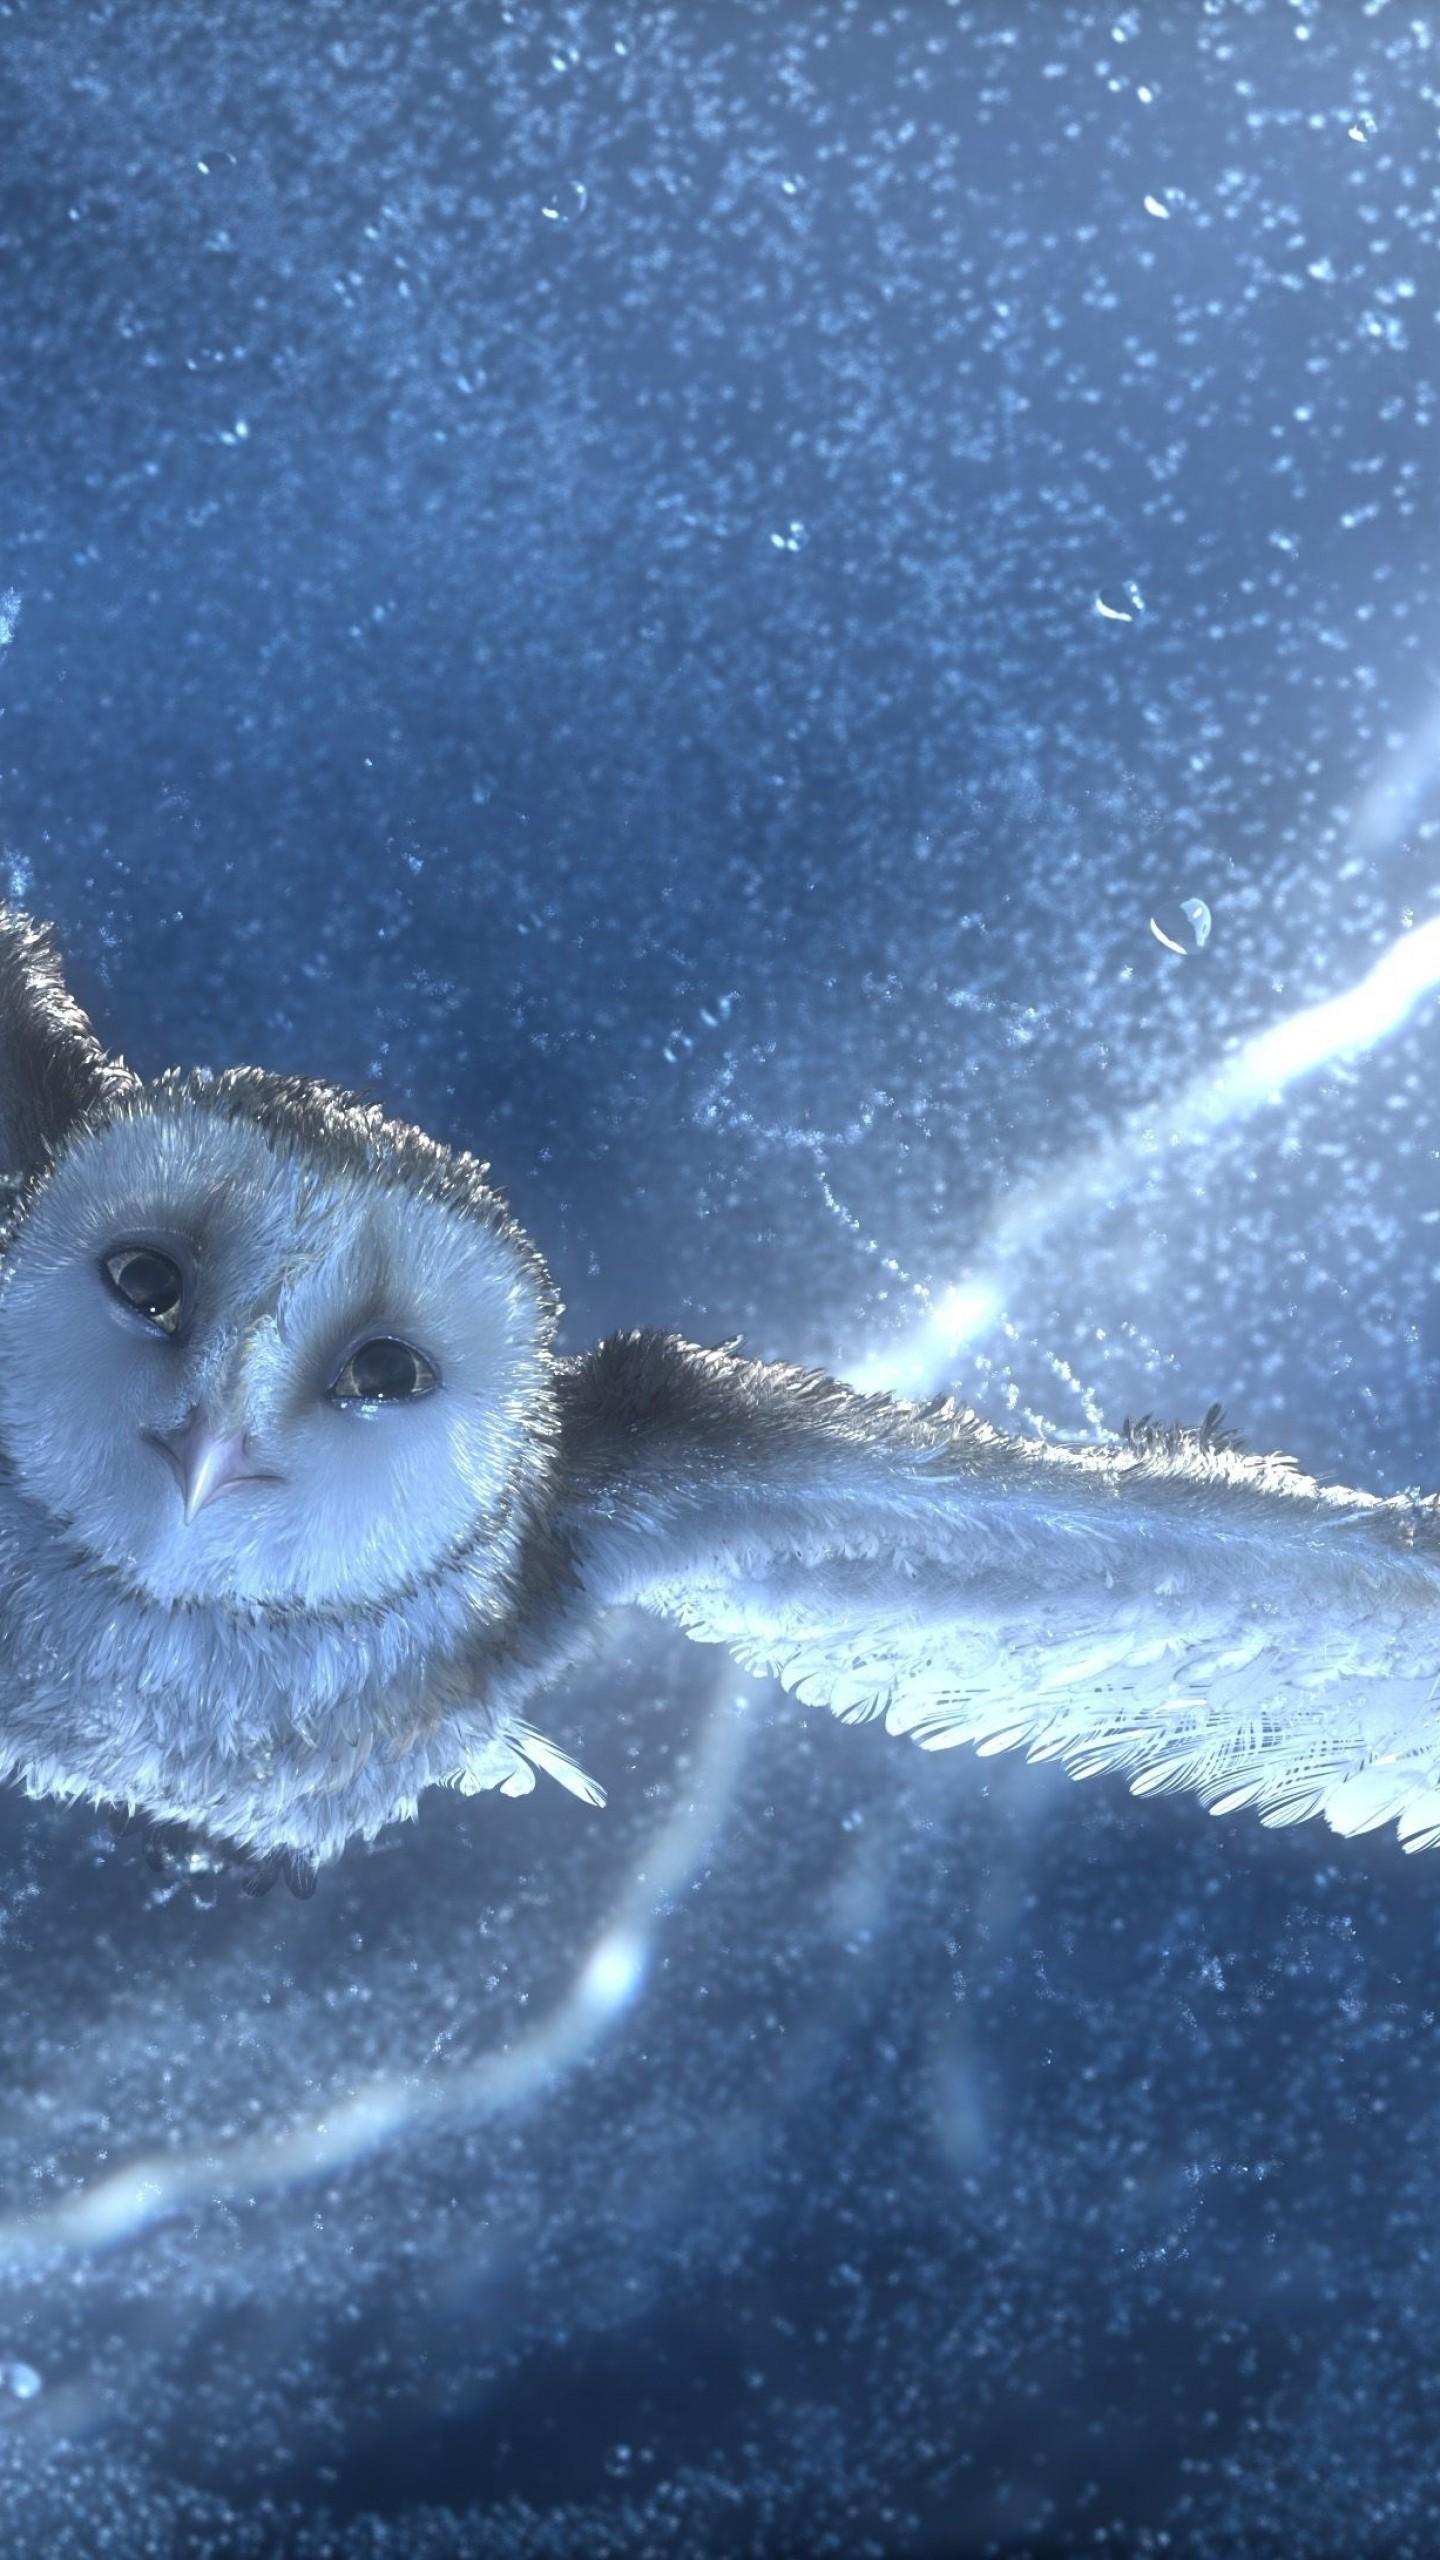 Pinterest Wallpapers Cute Wallpaper Owl Flying Snow Storm Lightning Blue Bird